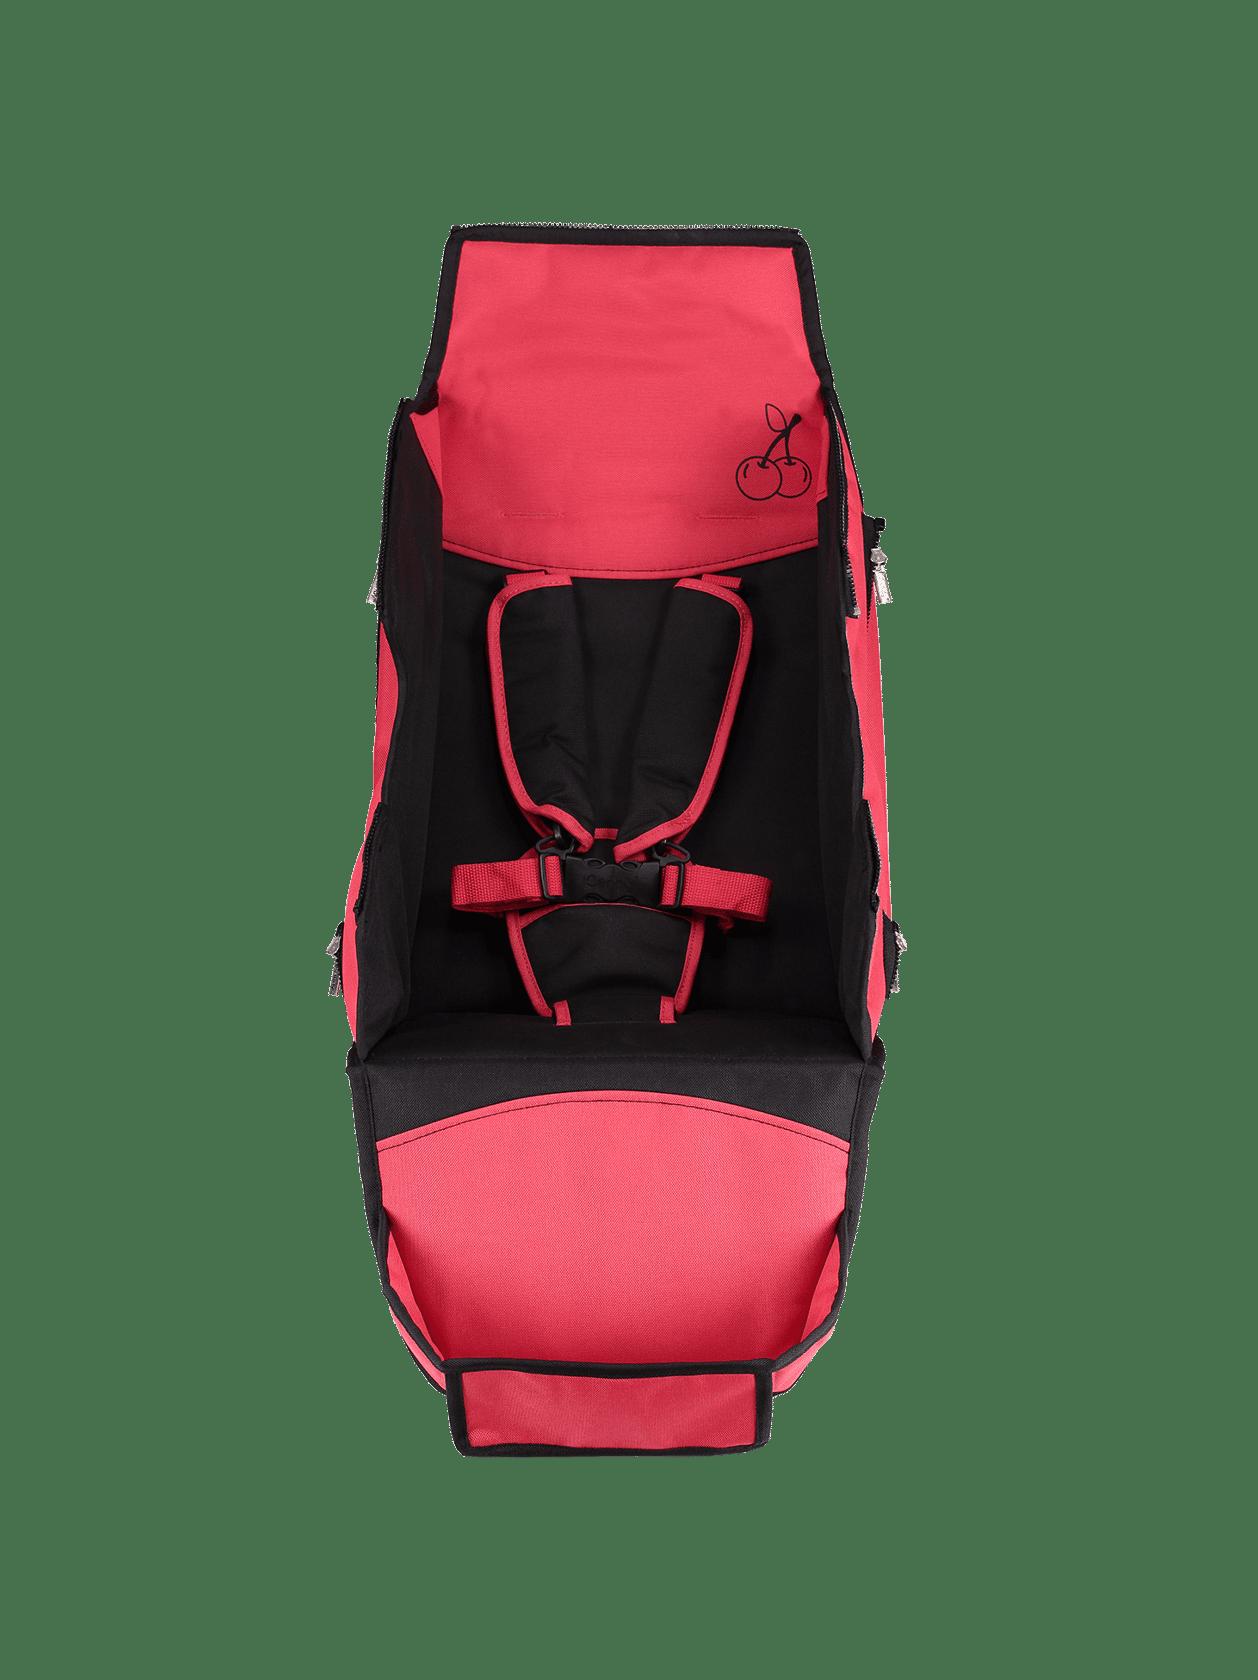 Cherry Seat Unit Fabric Liquorice